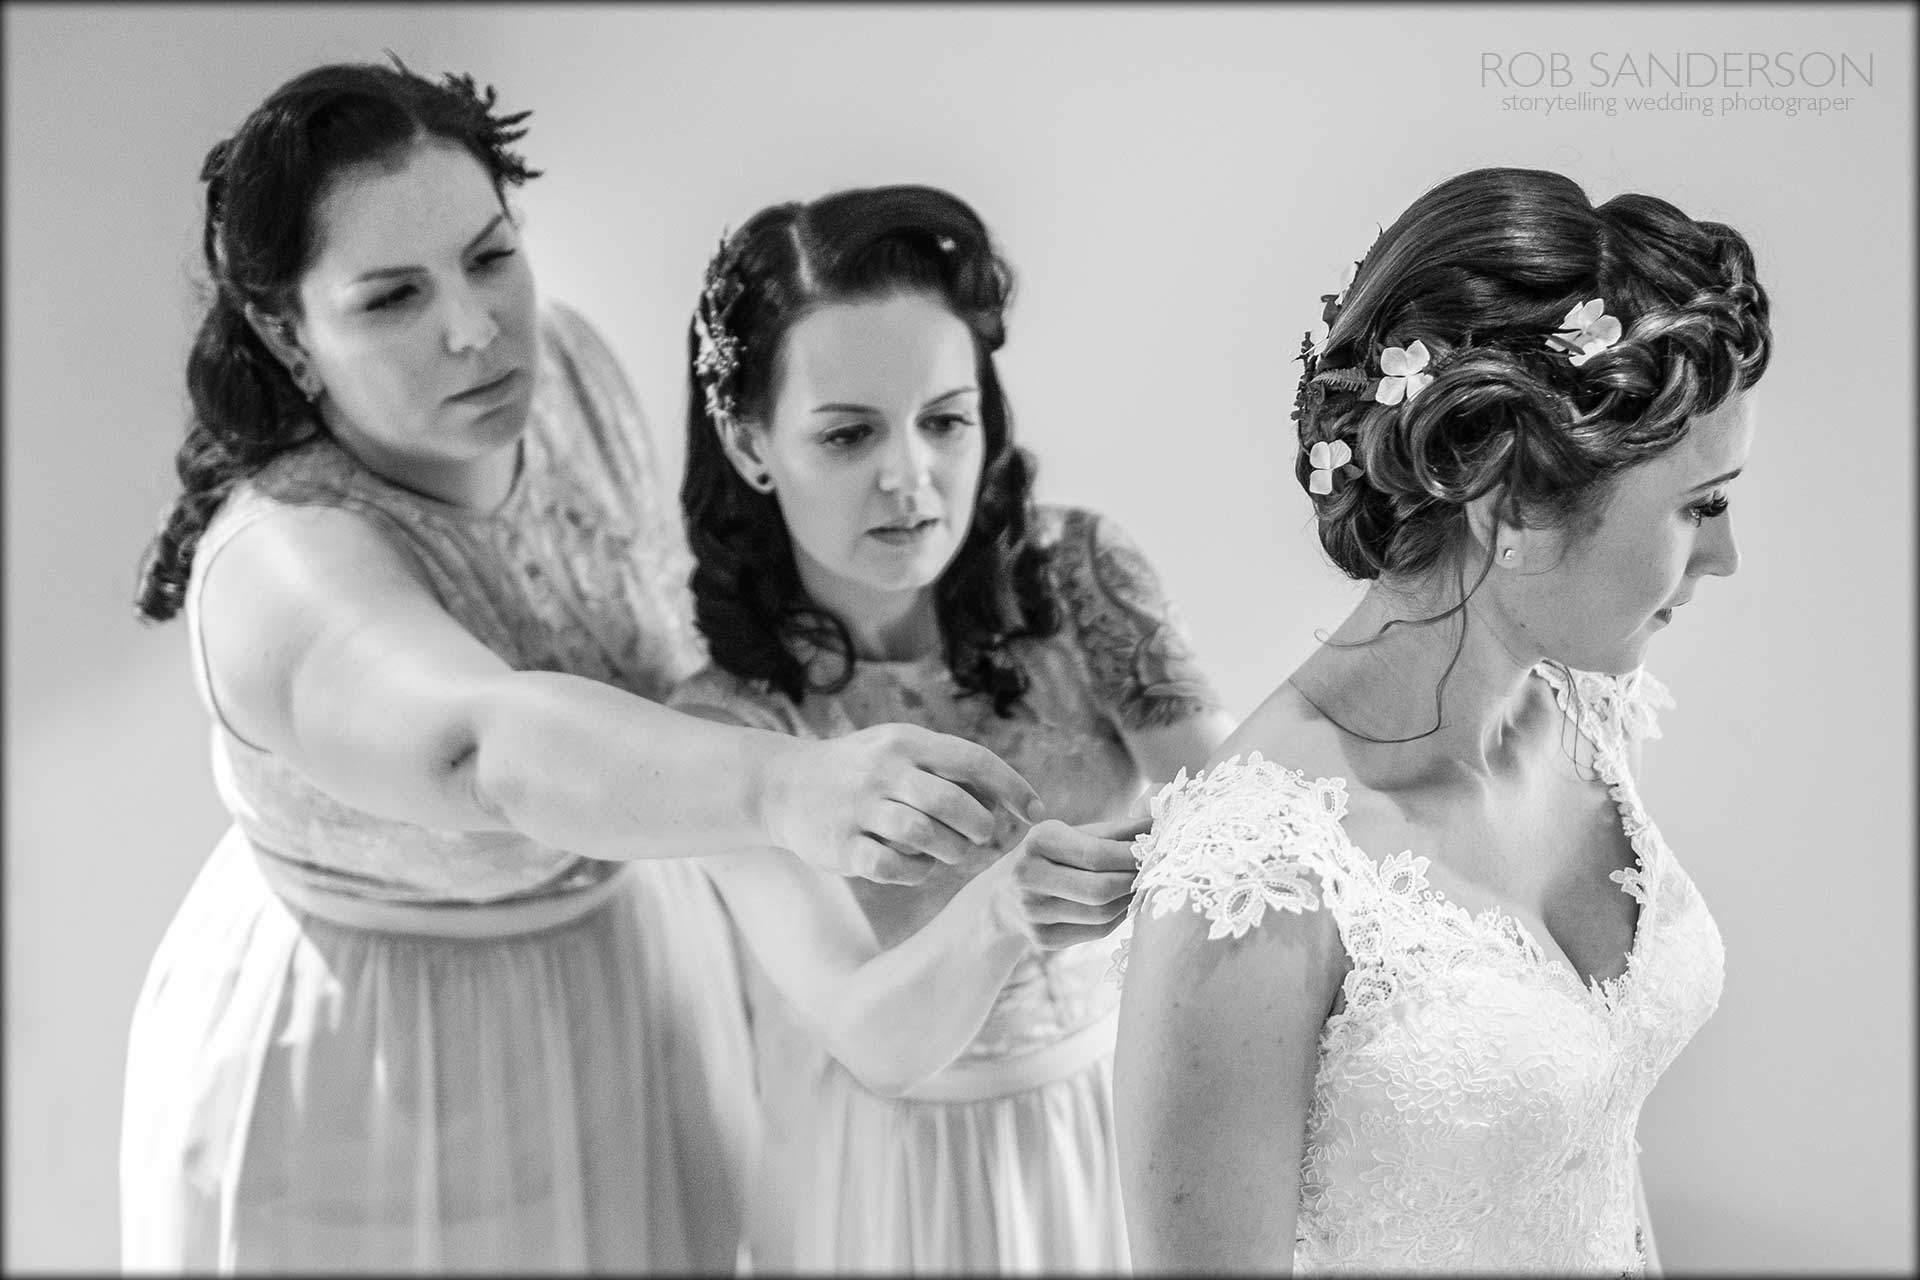 Bridesmaids help fasten the wedding dress